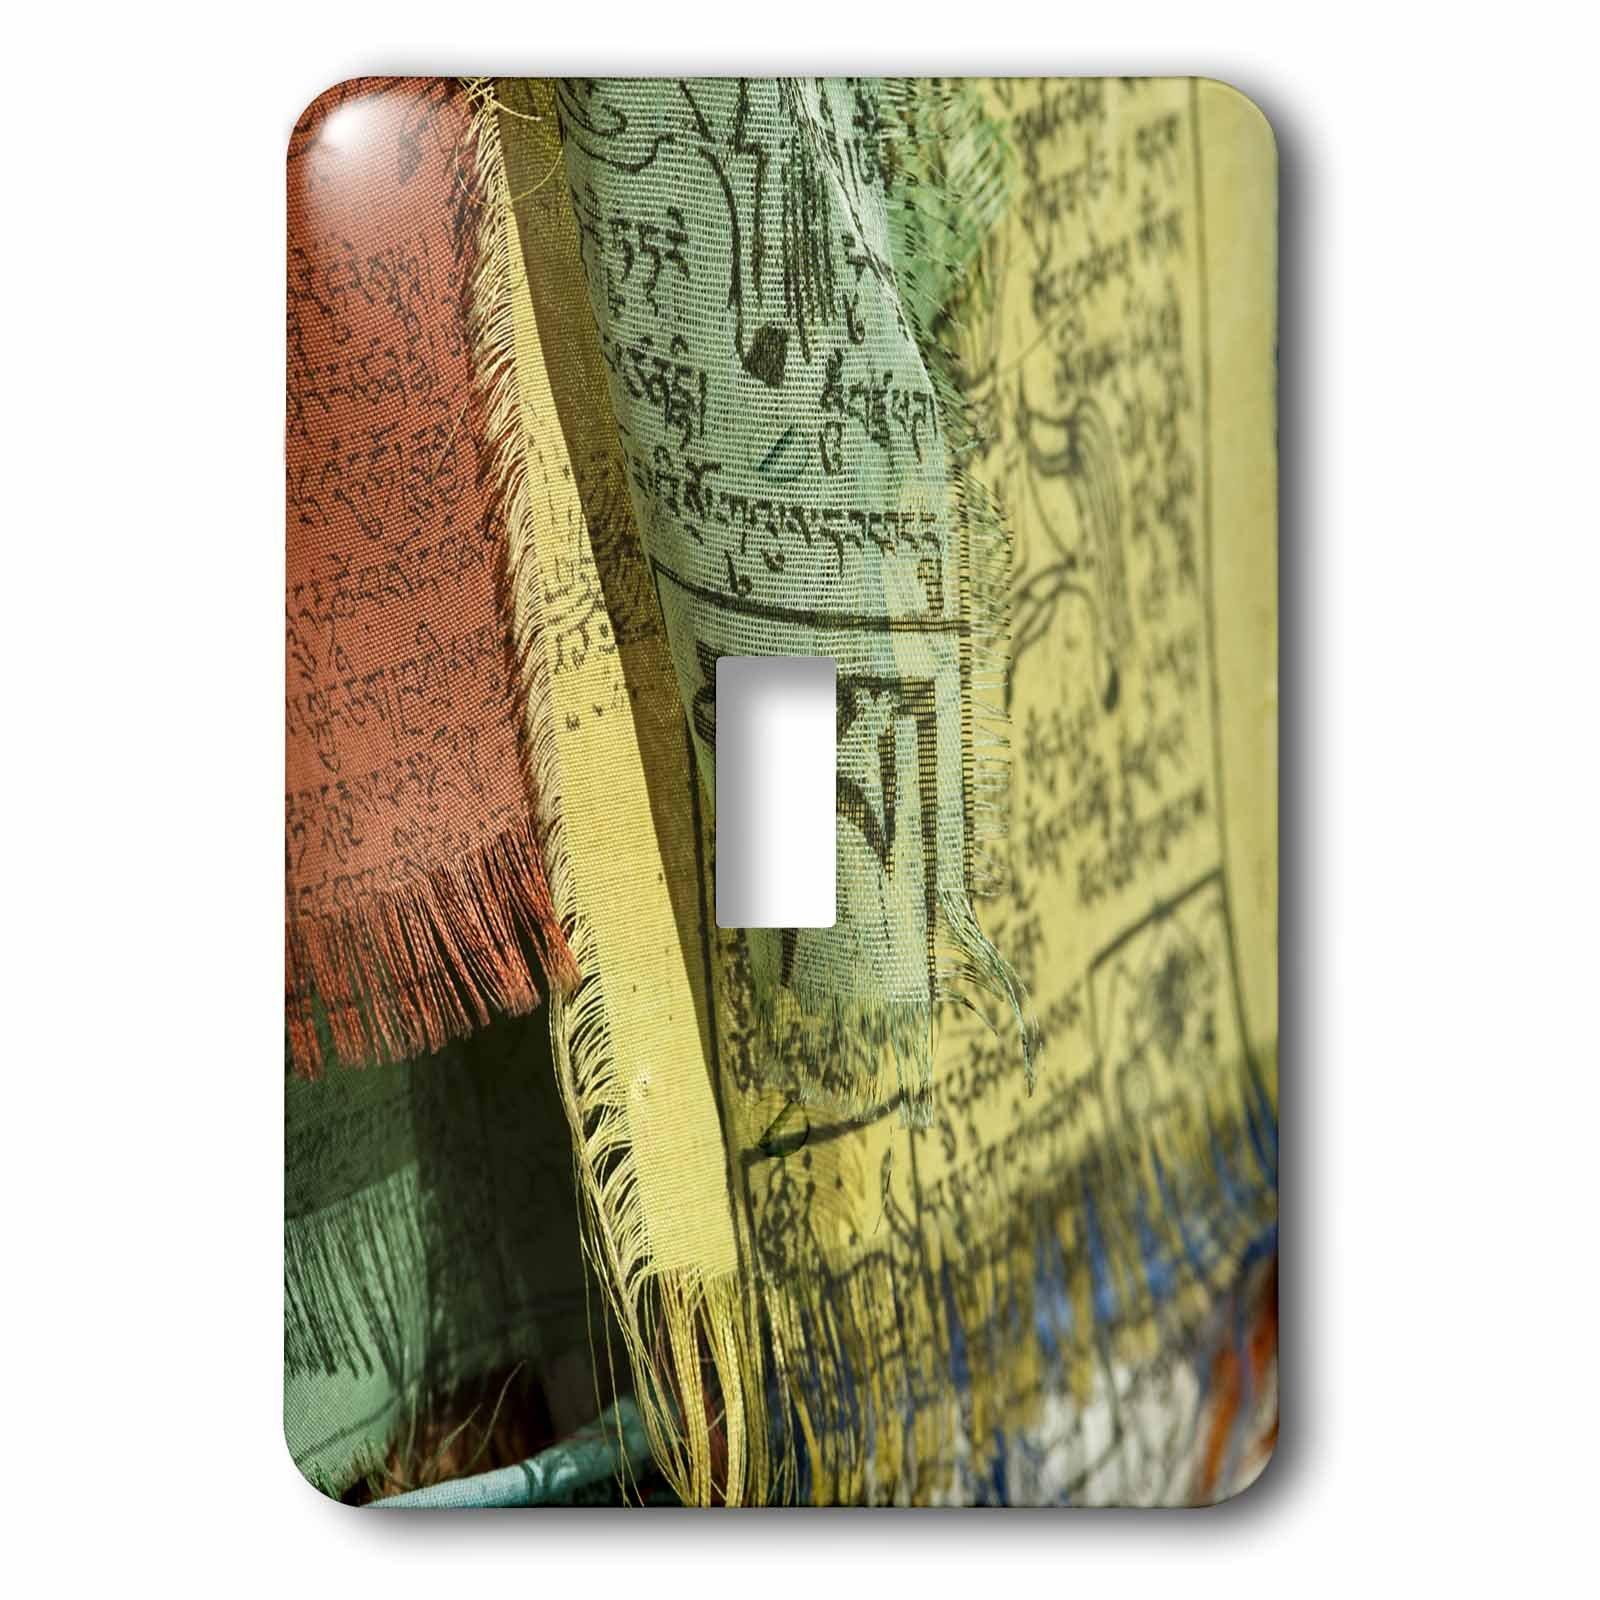 3dRose LLC 3dRose LLC lsp_132511_1 India, Ladakh, Leh, colorful Tibetan prayer flags - AS10 AAS0020 - Anthony Asael - Single Toggle Switch